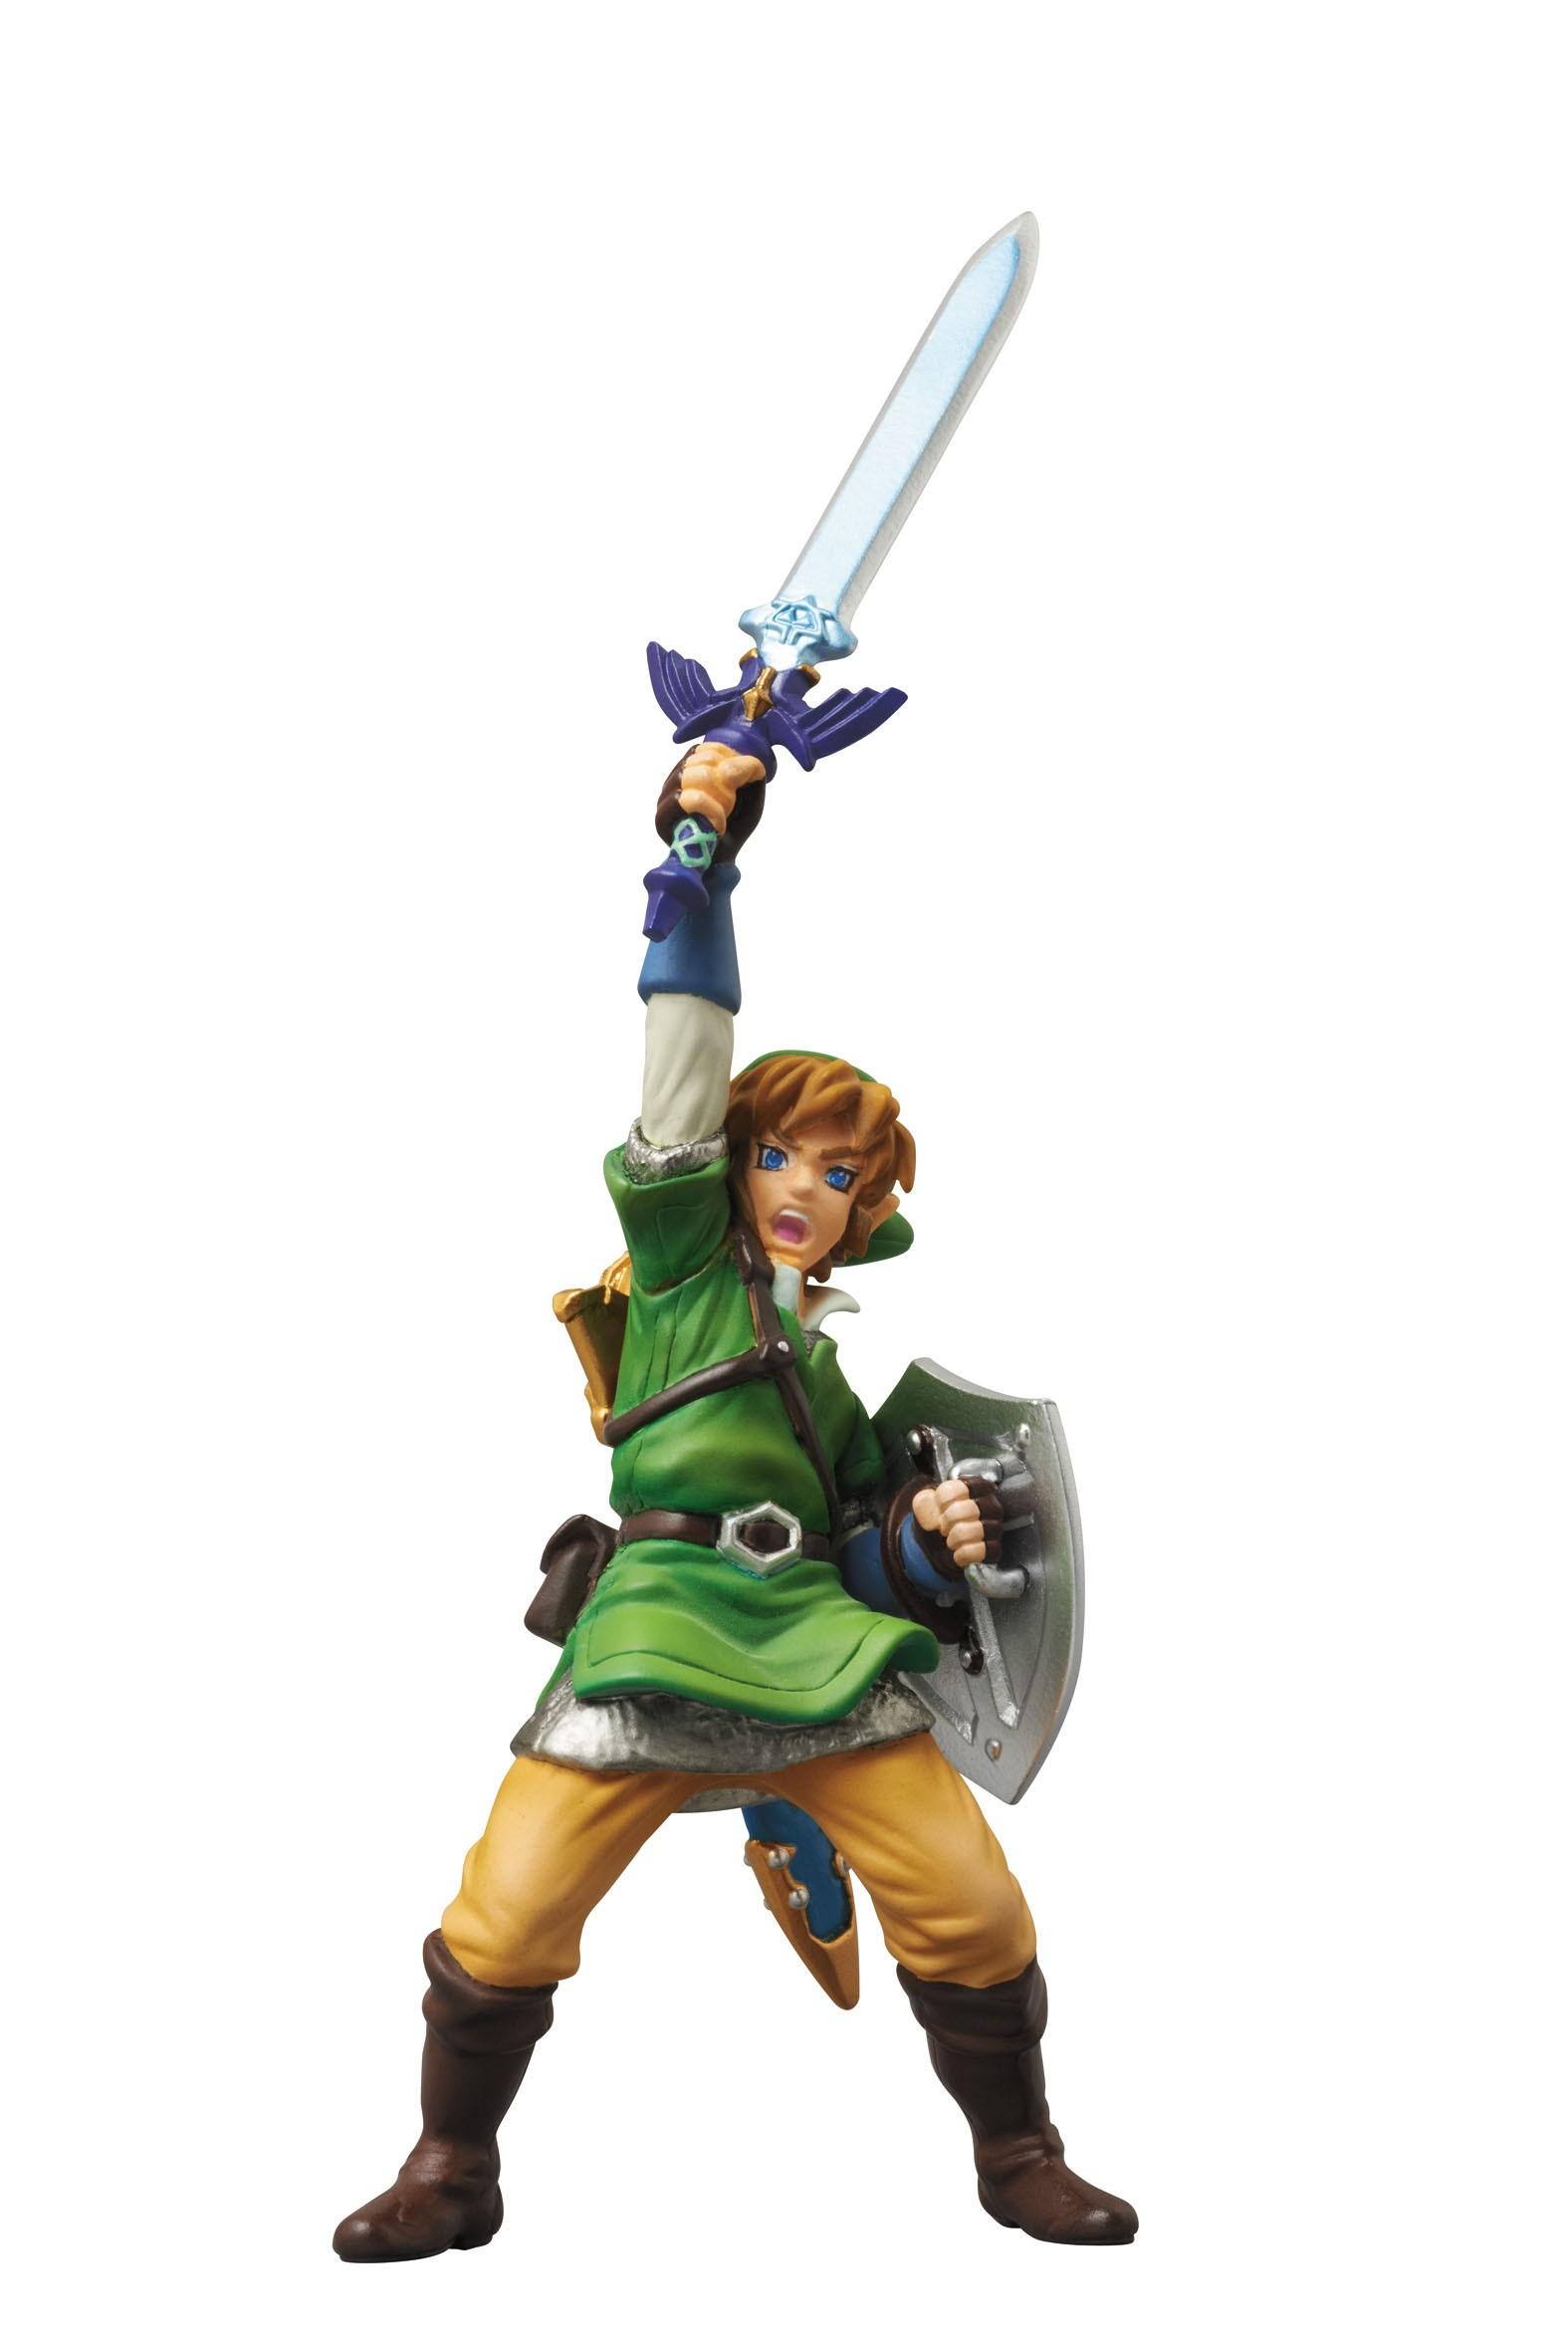 Nintendo - UDF Series 1 Mini Figure - Link (The Legend of Zelda: Skyward Sword) 11 cm